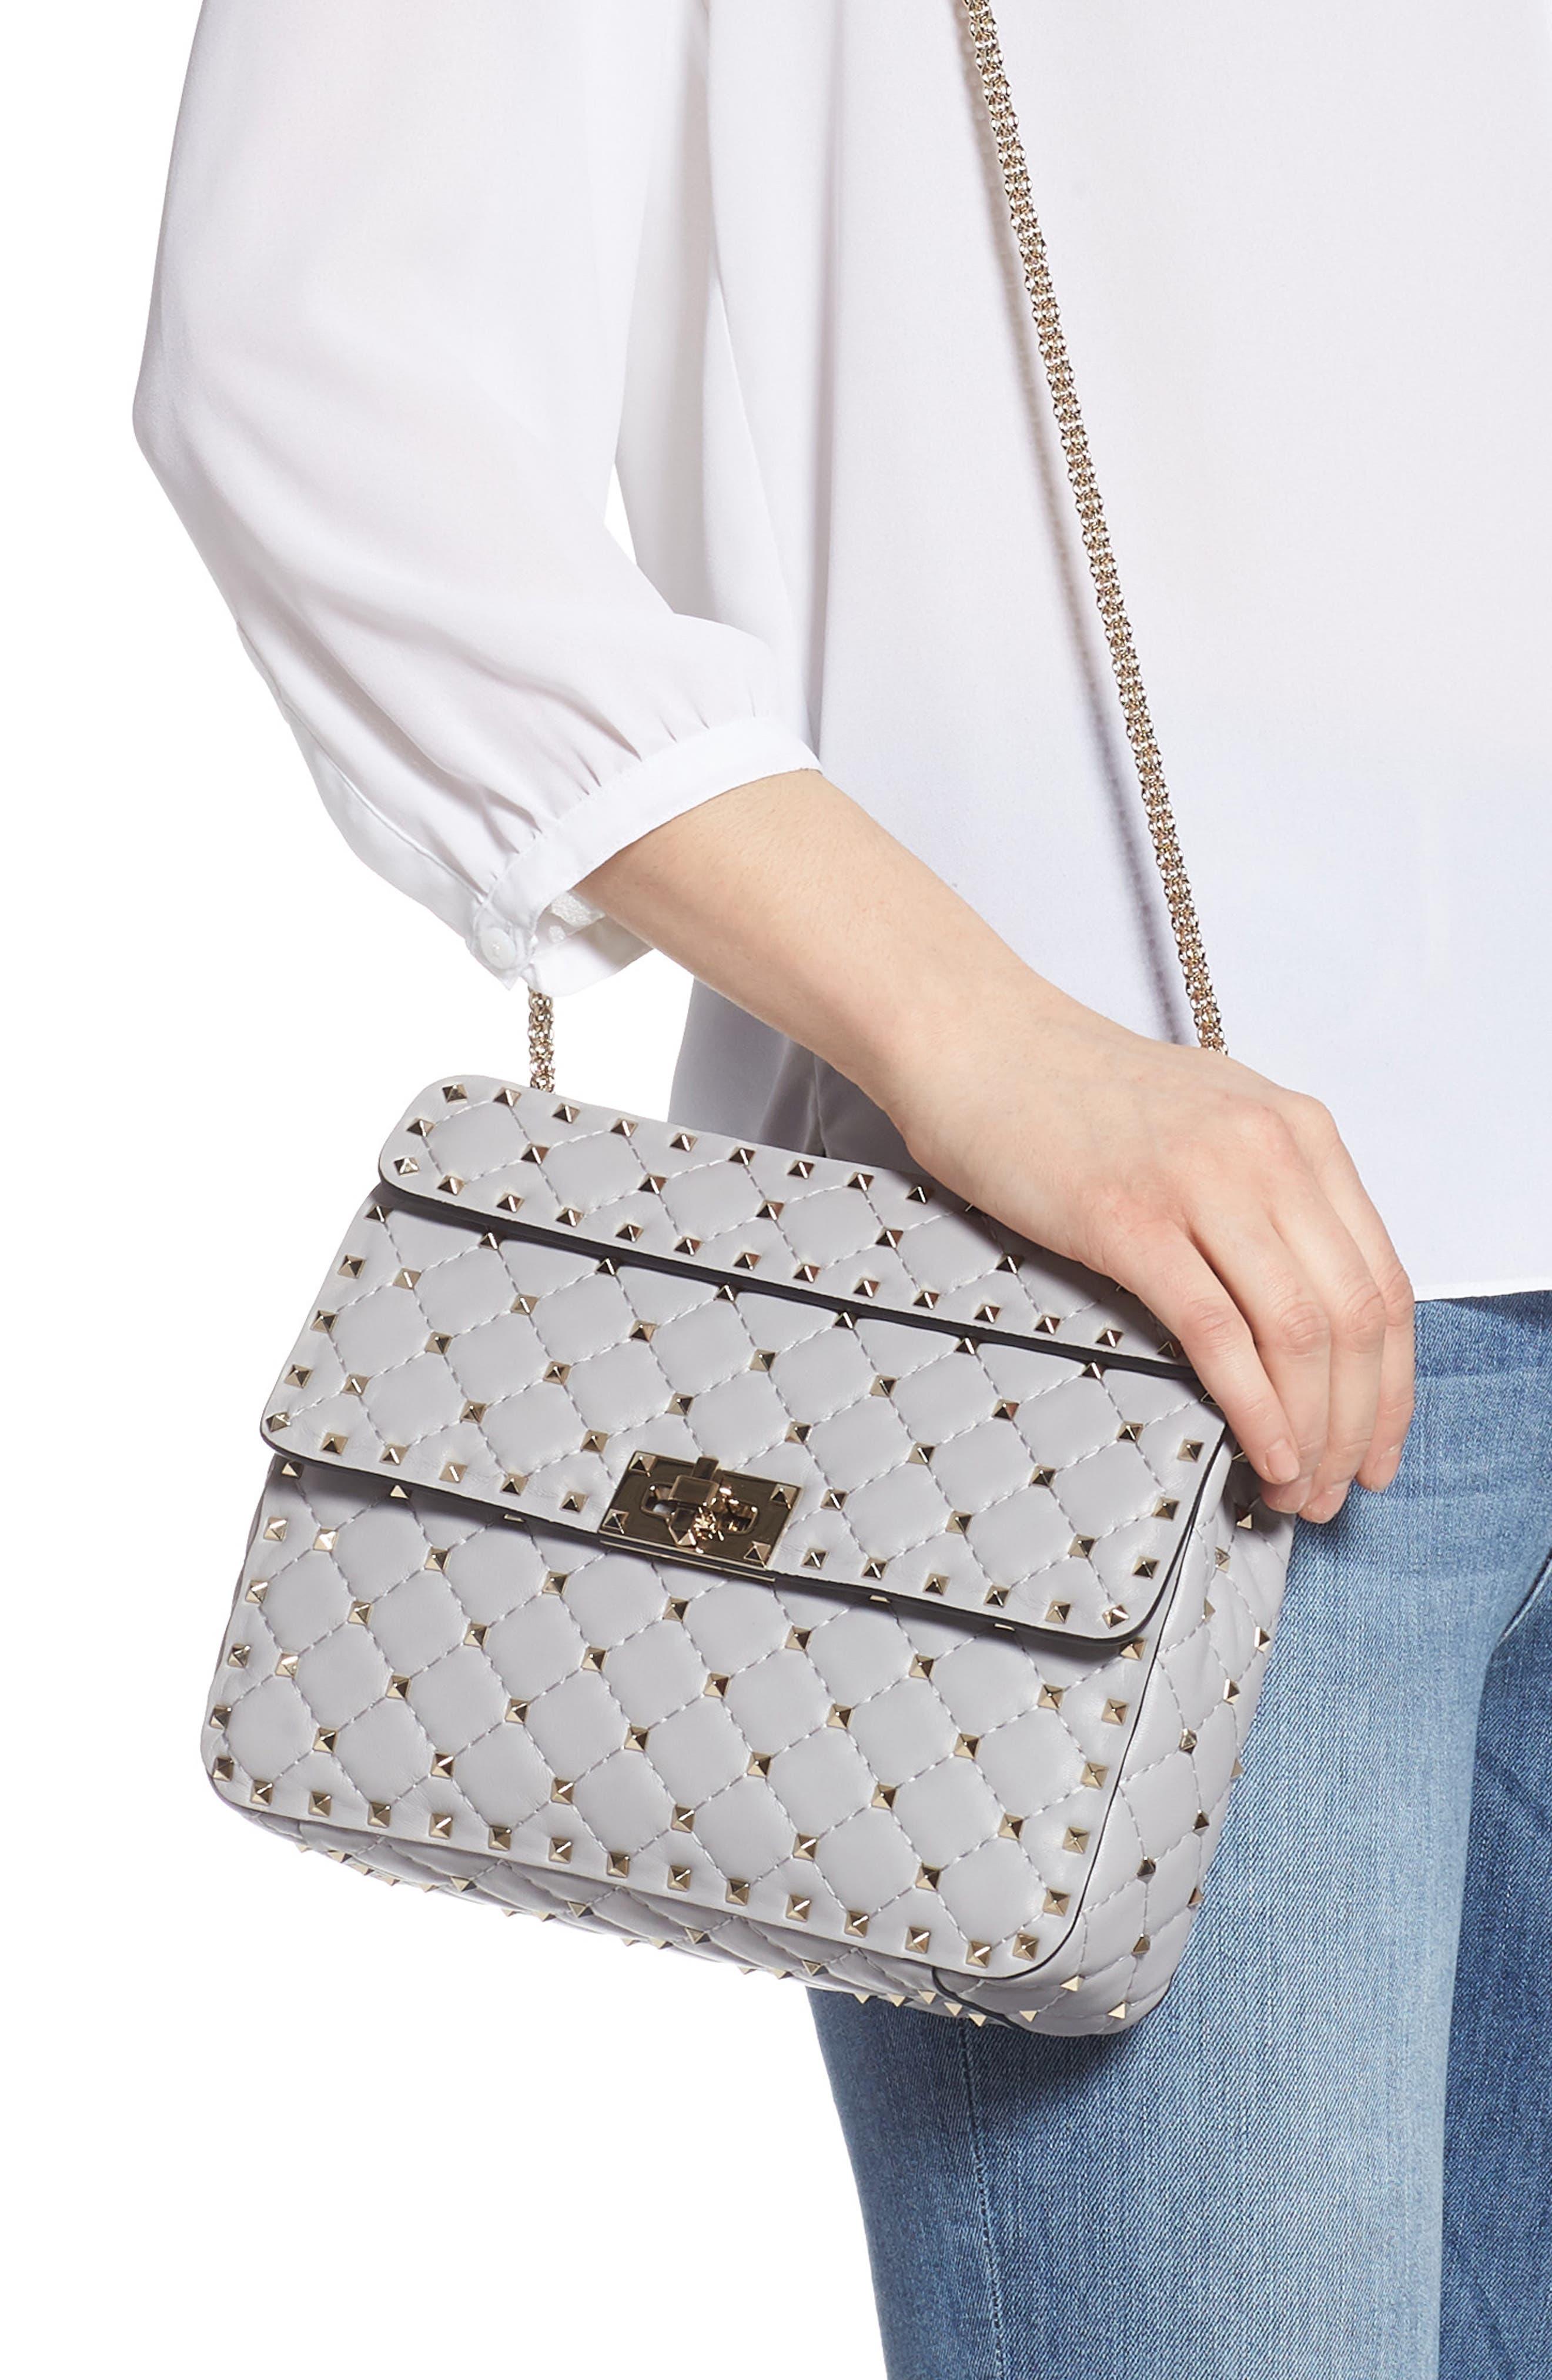 VALENTINO GARAVANI, Medium Rockstud Matelassé Quilted Leather Crossbody Bag, Alternate thumbnail 3, color, PASTEL GREY